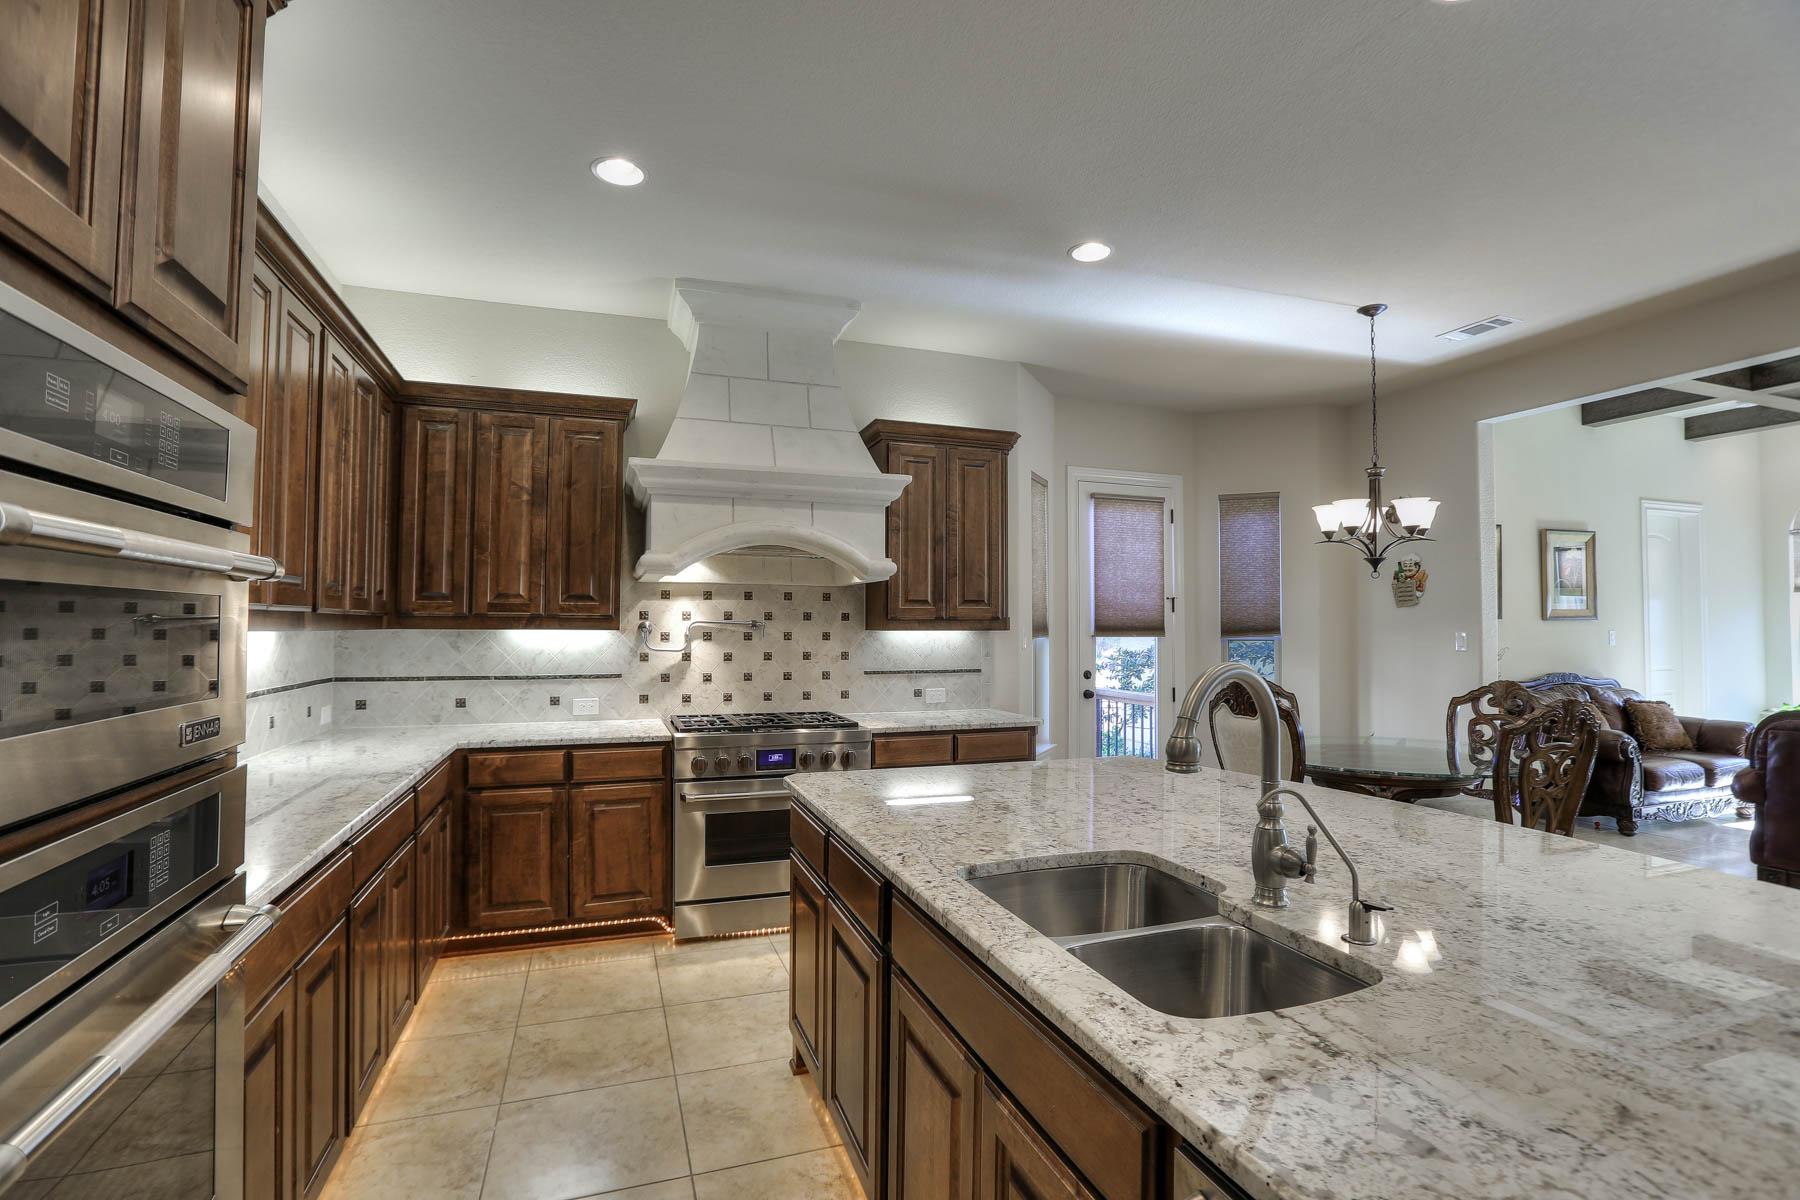 Additional photo for property listing at Magnificent Estate in The Dominion 6334 Granada Way San Antonio, Texas 78257 Estados Unidos